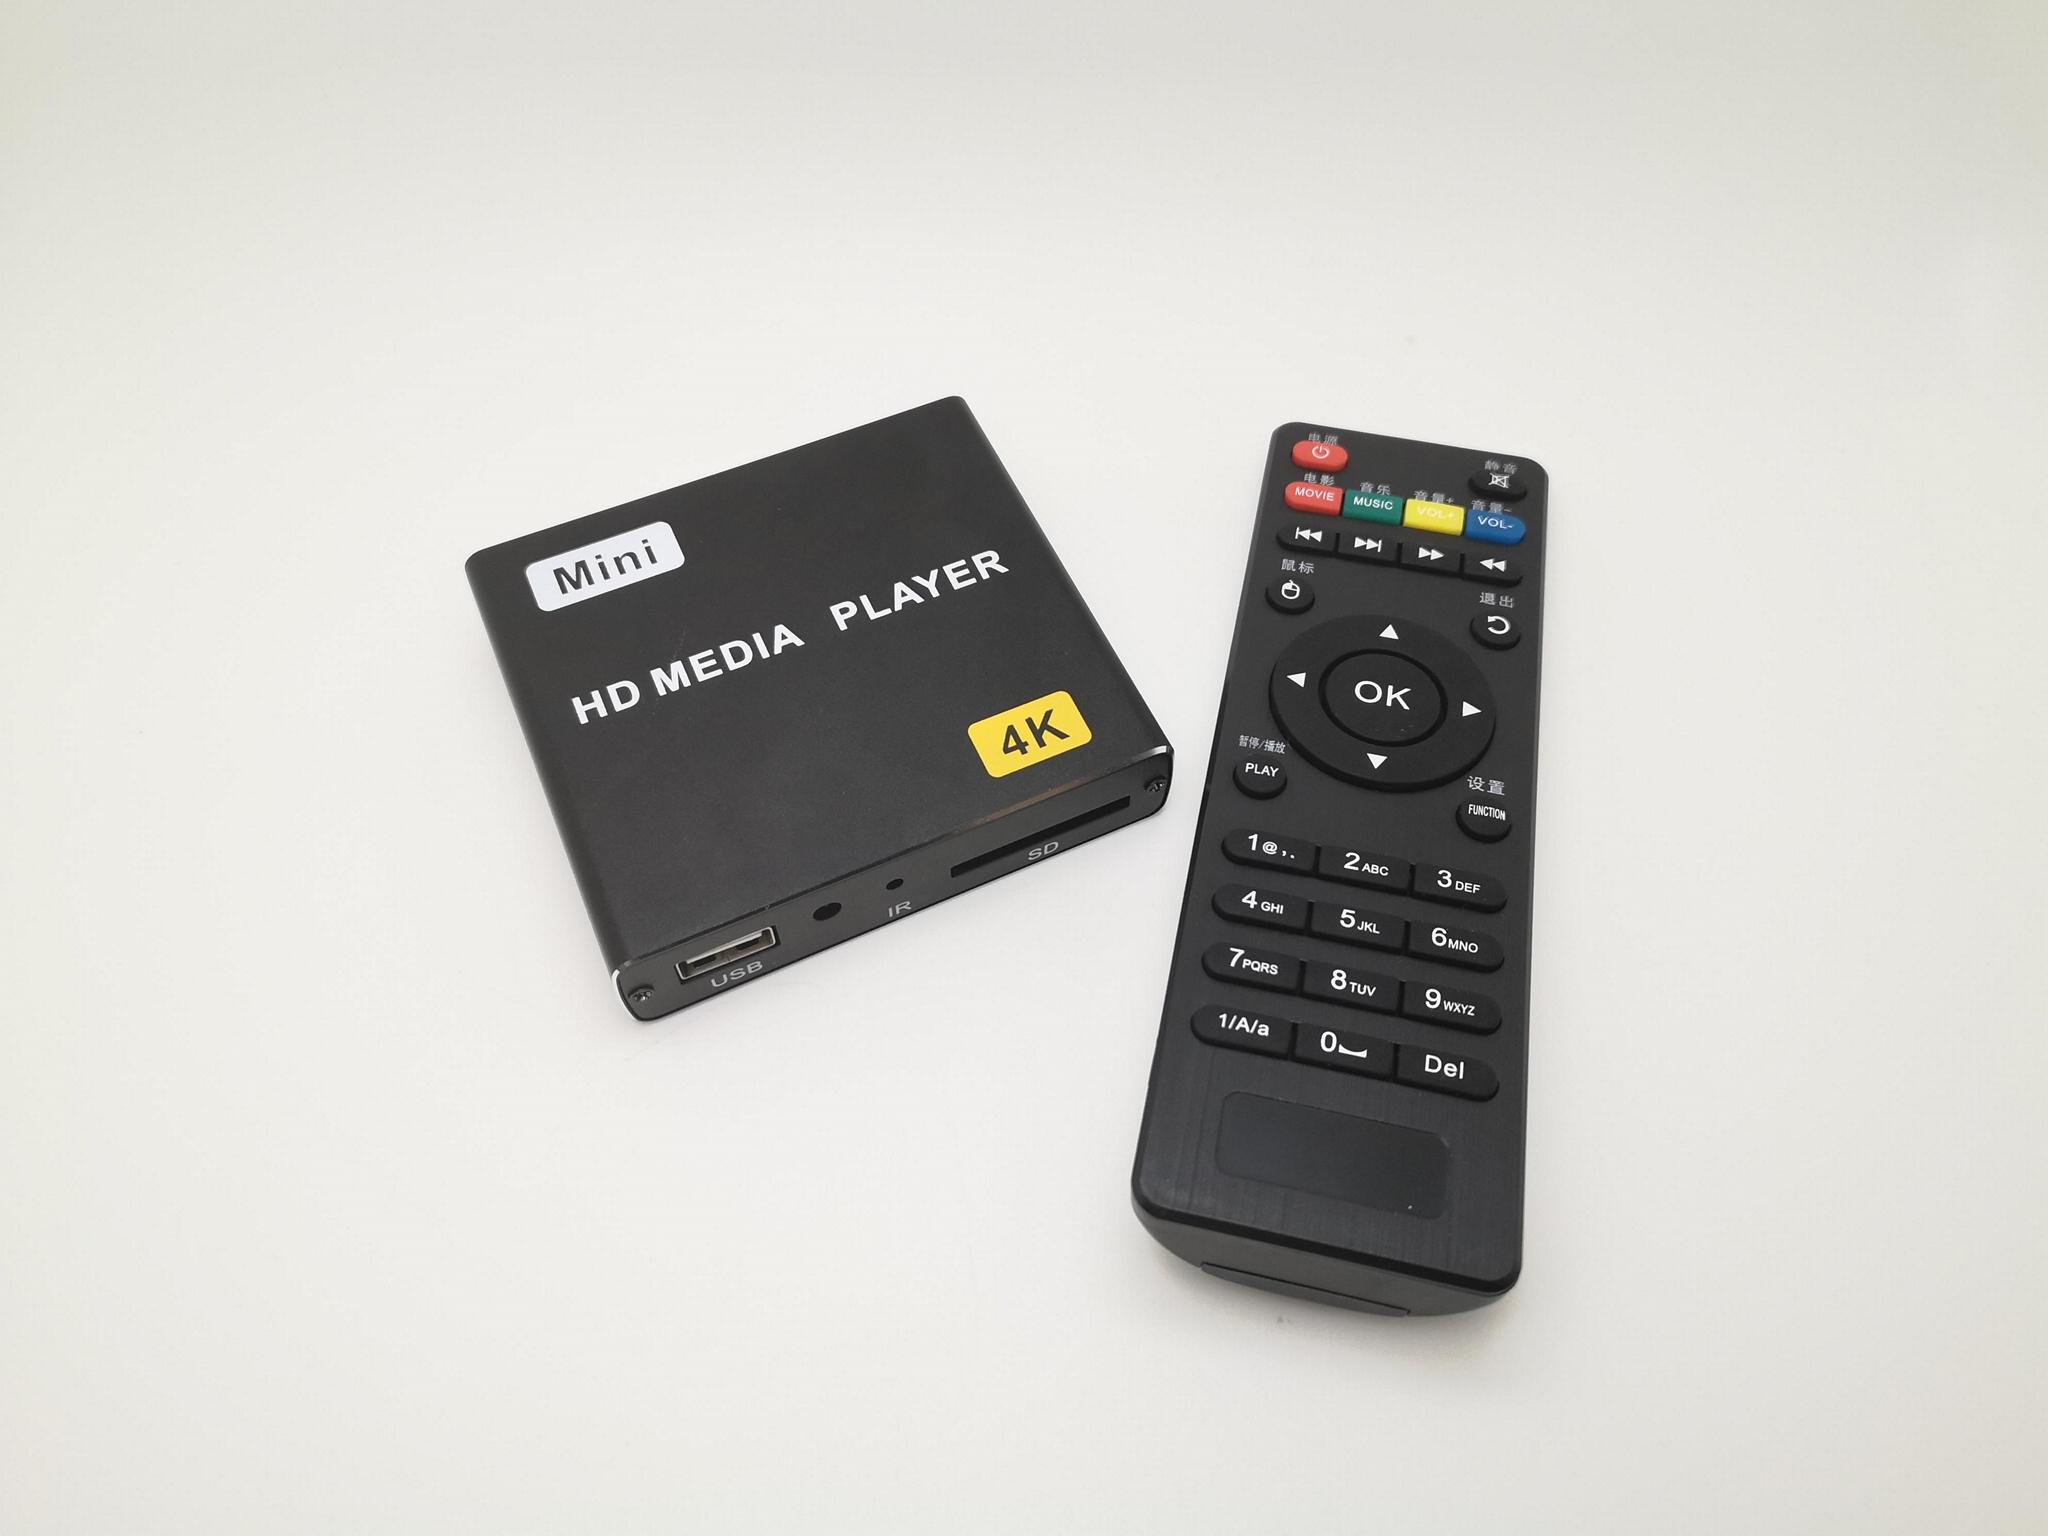 4K高清播放器單機廣告機通電自動循環播放視頻PPT橫豎屏U盤SD播放 5